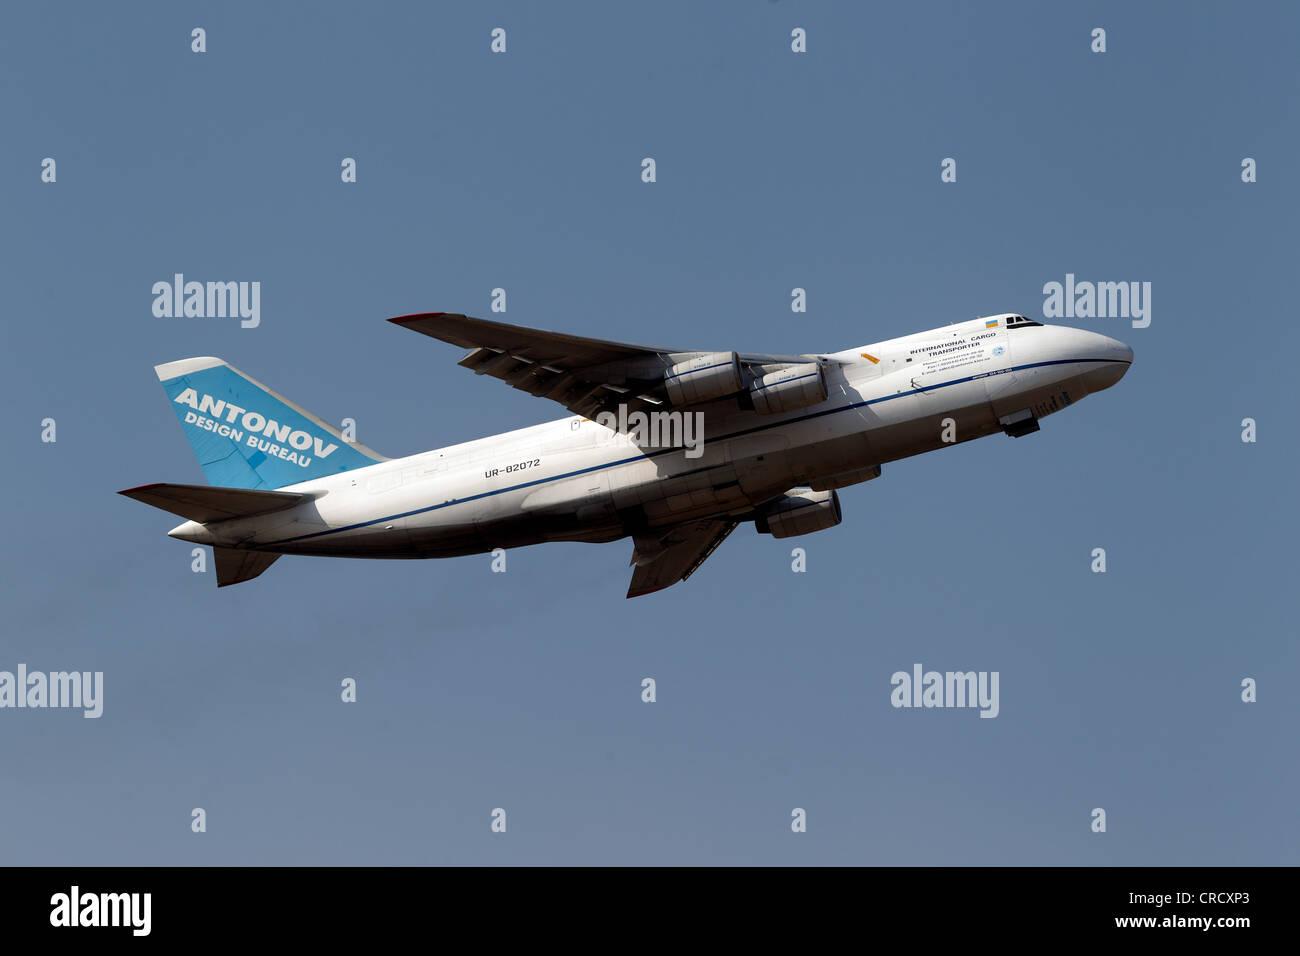 Antonov AN124 cargo plane, Lautzenhausen, Rhineland-Palatinate, Germany, Europe - Stock Image